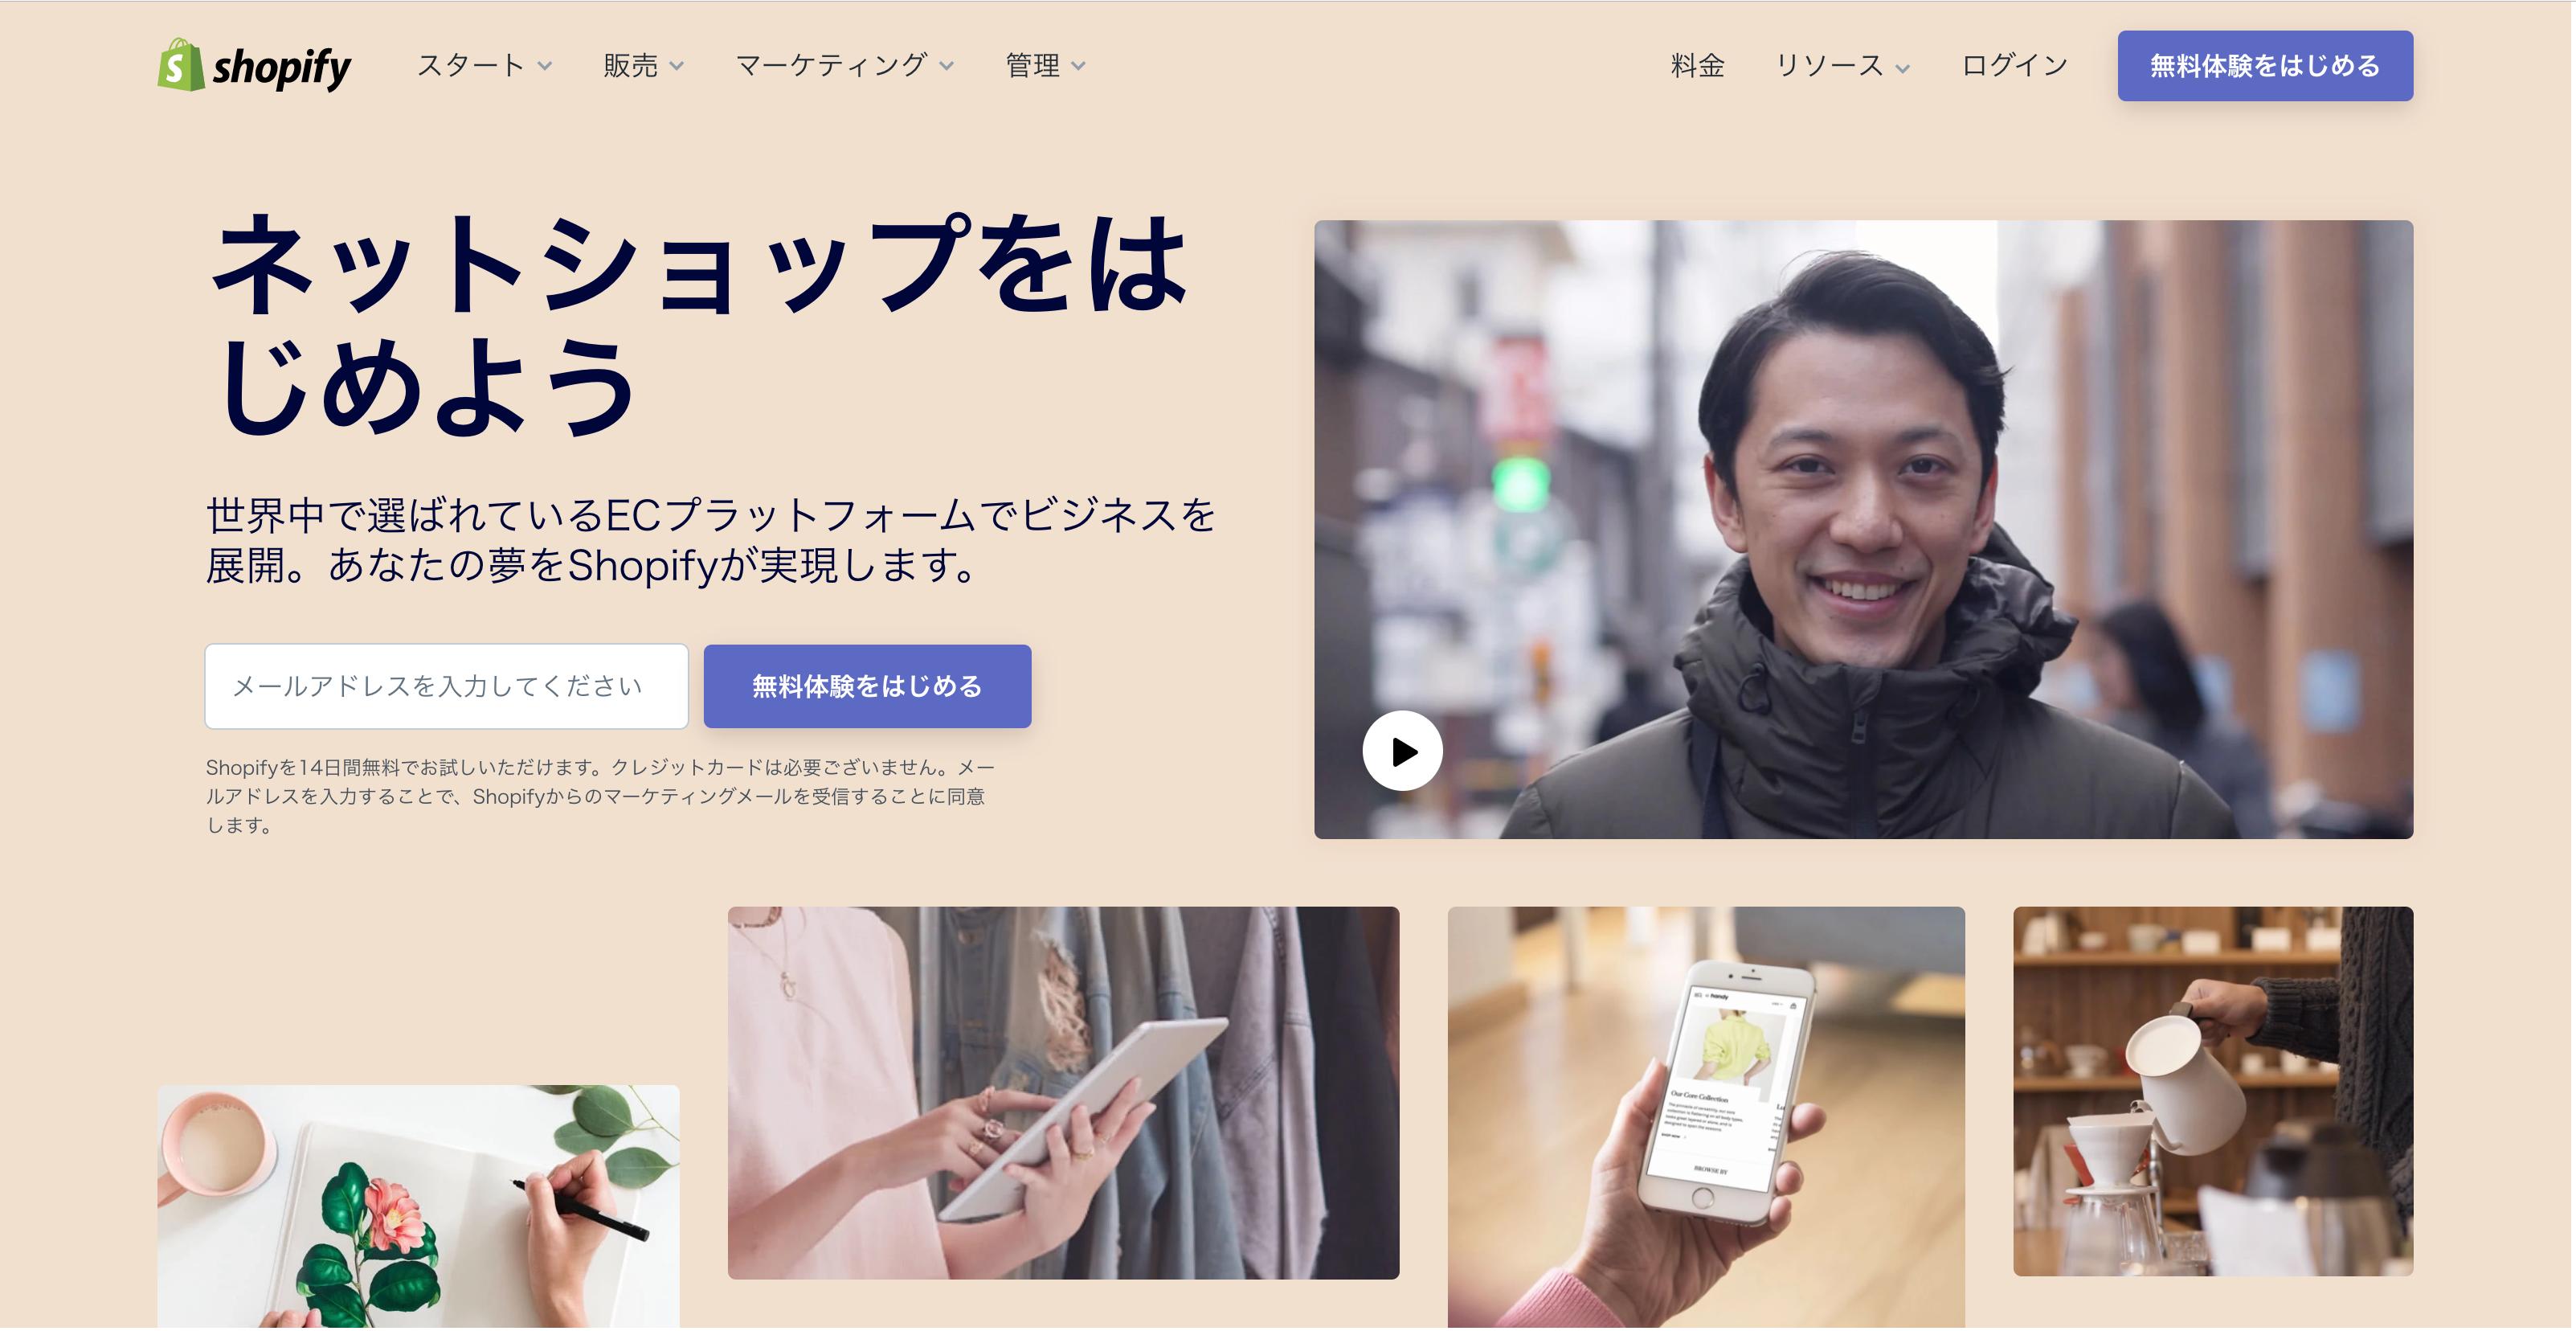 Shopify 日本語サイト